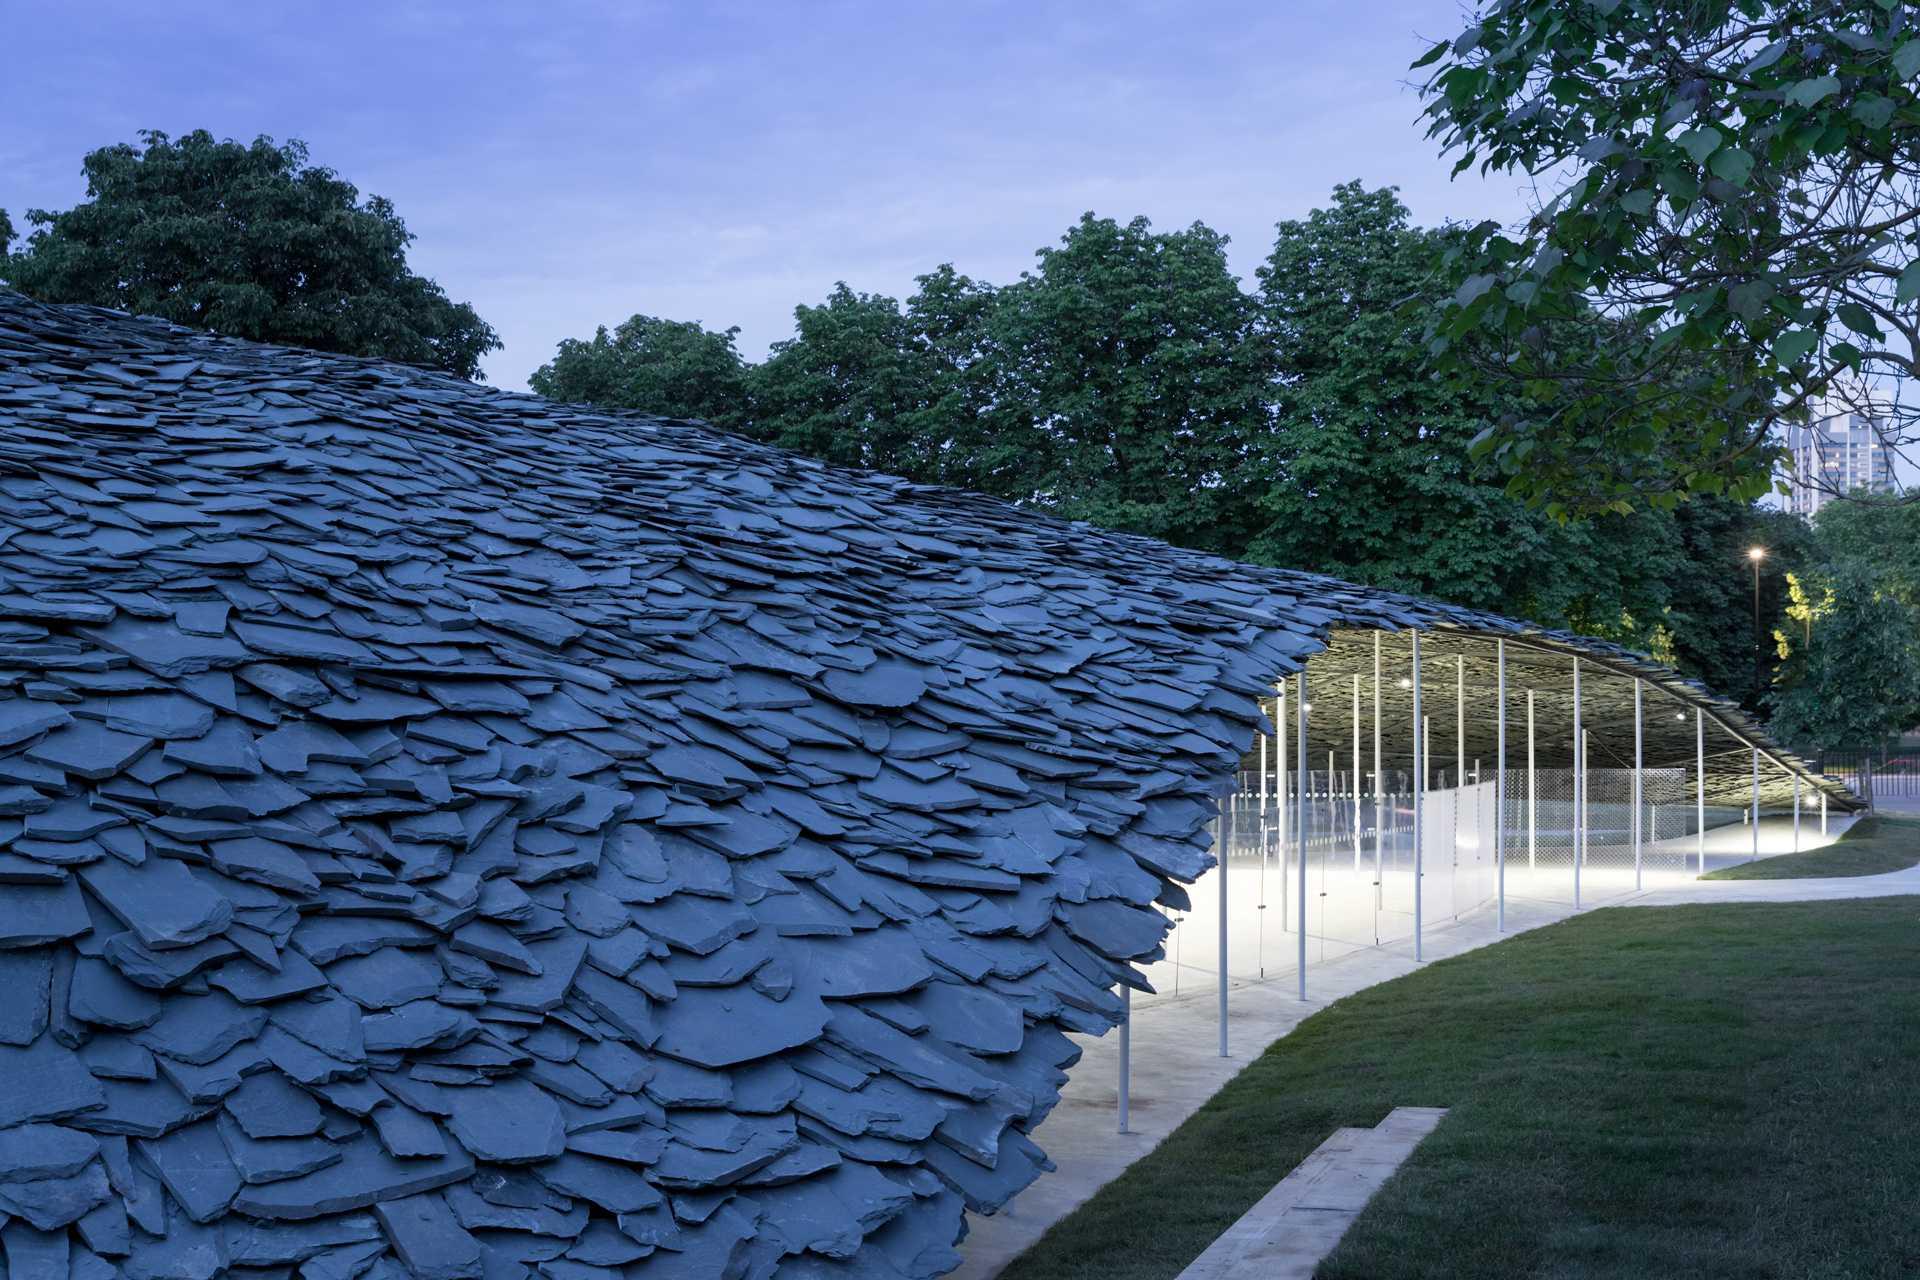 Serpentine Pavilion 2019  - 7 Iwan Baan 3 46